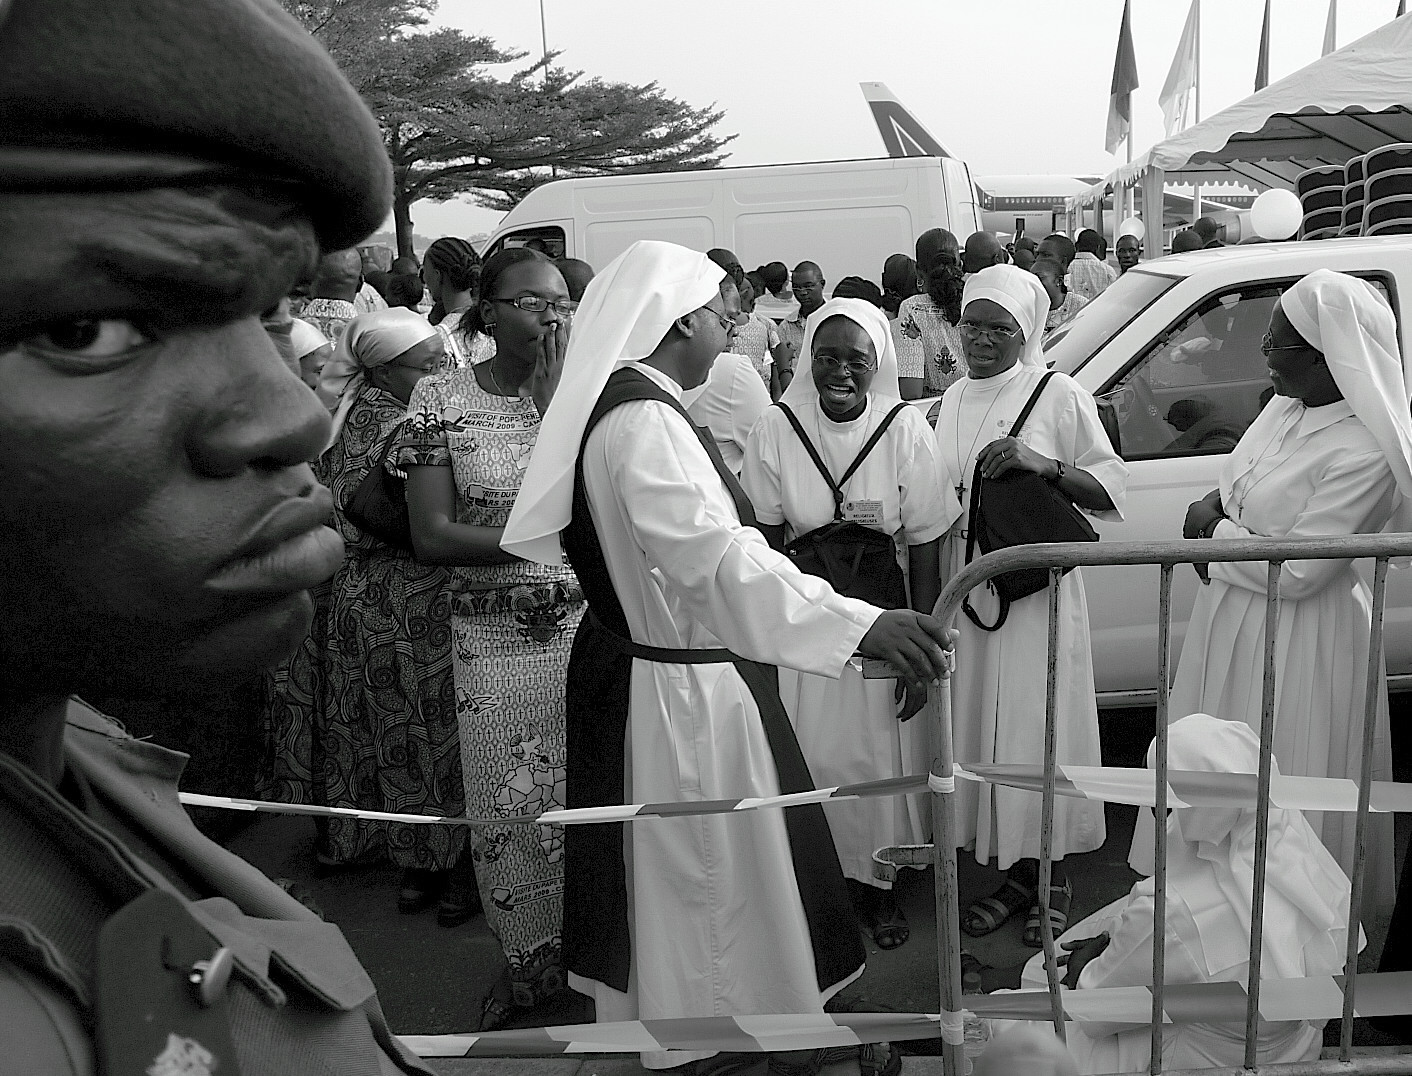 Nsimalen - Cameroon, 2009